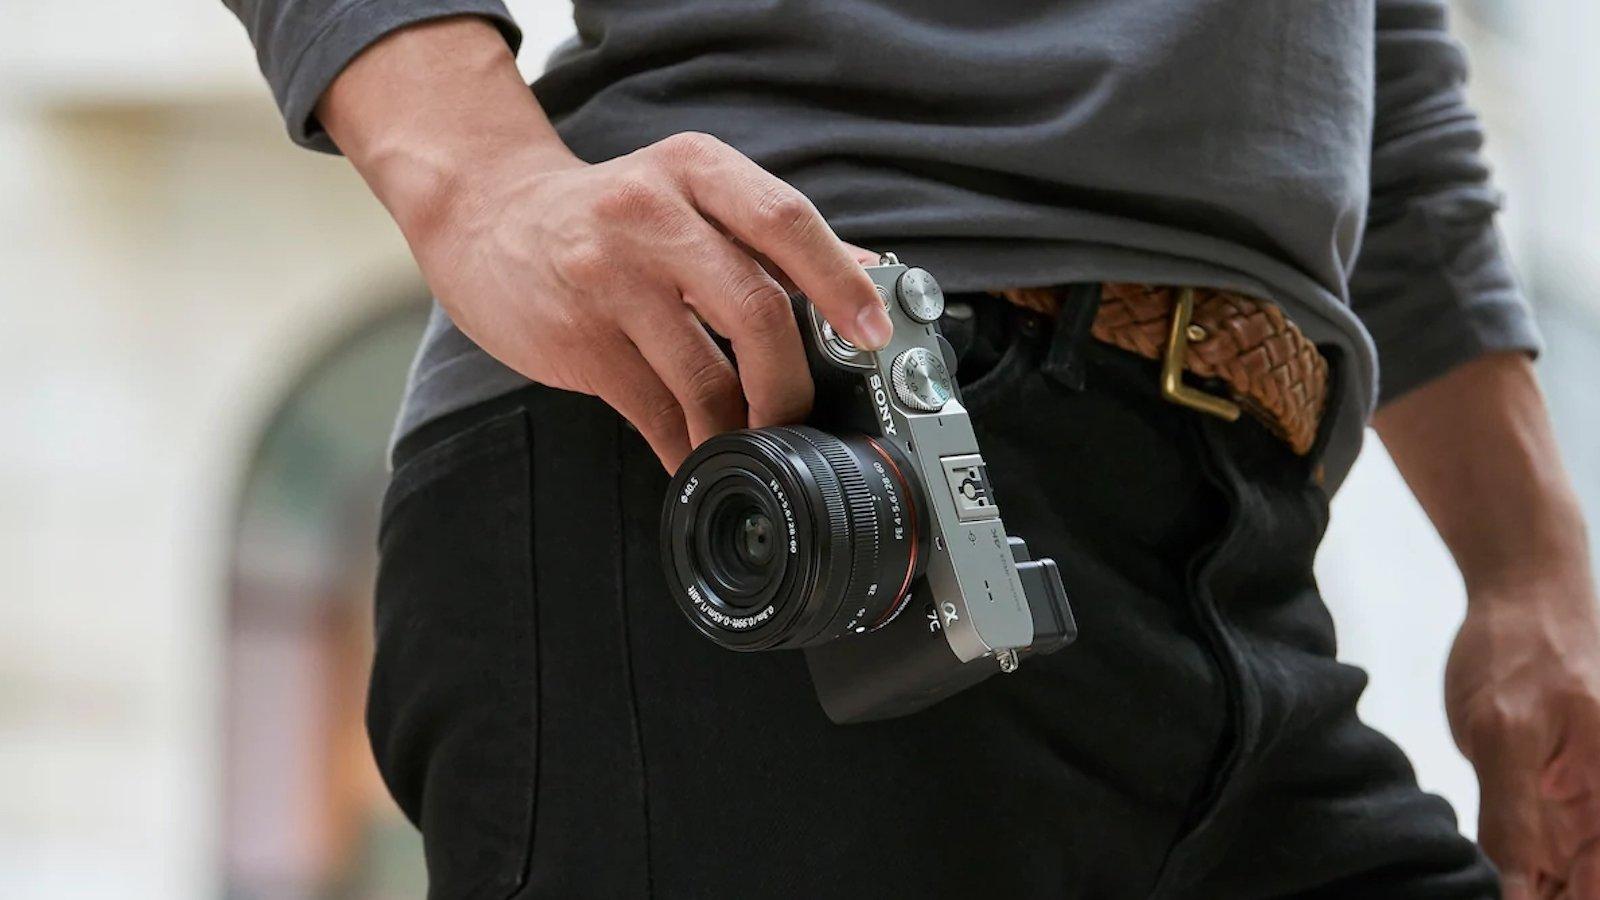 Sony Alpha a7C mirrorless digital camera has 5 stops of shake reduction